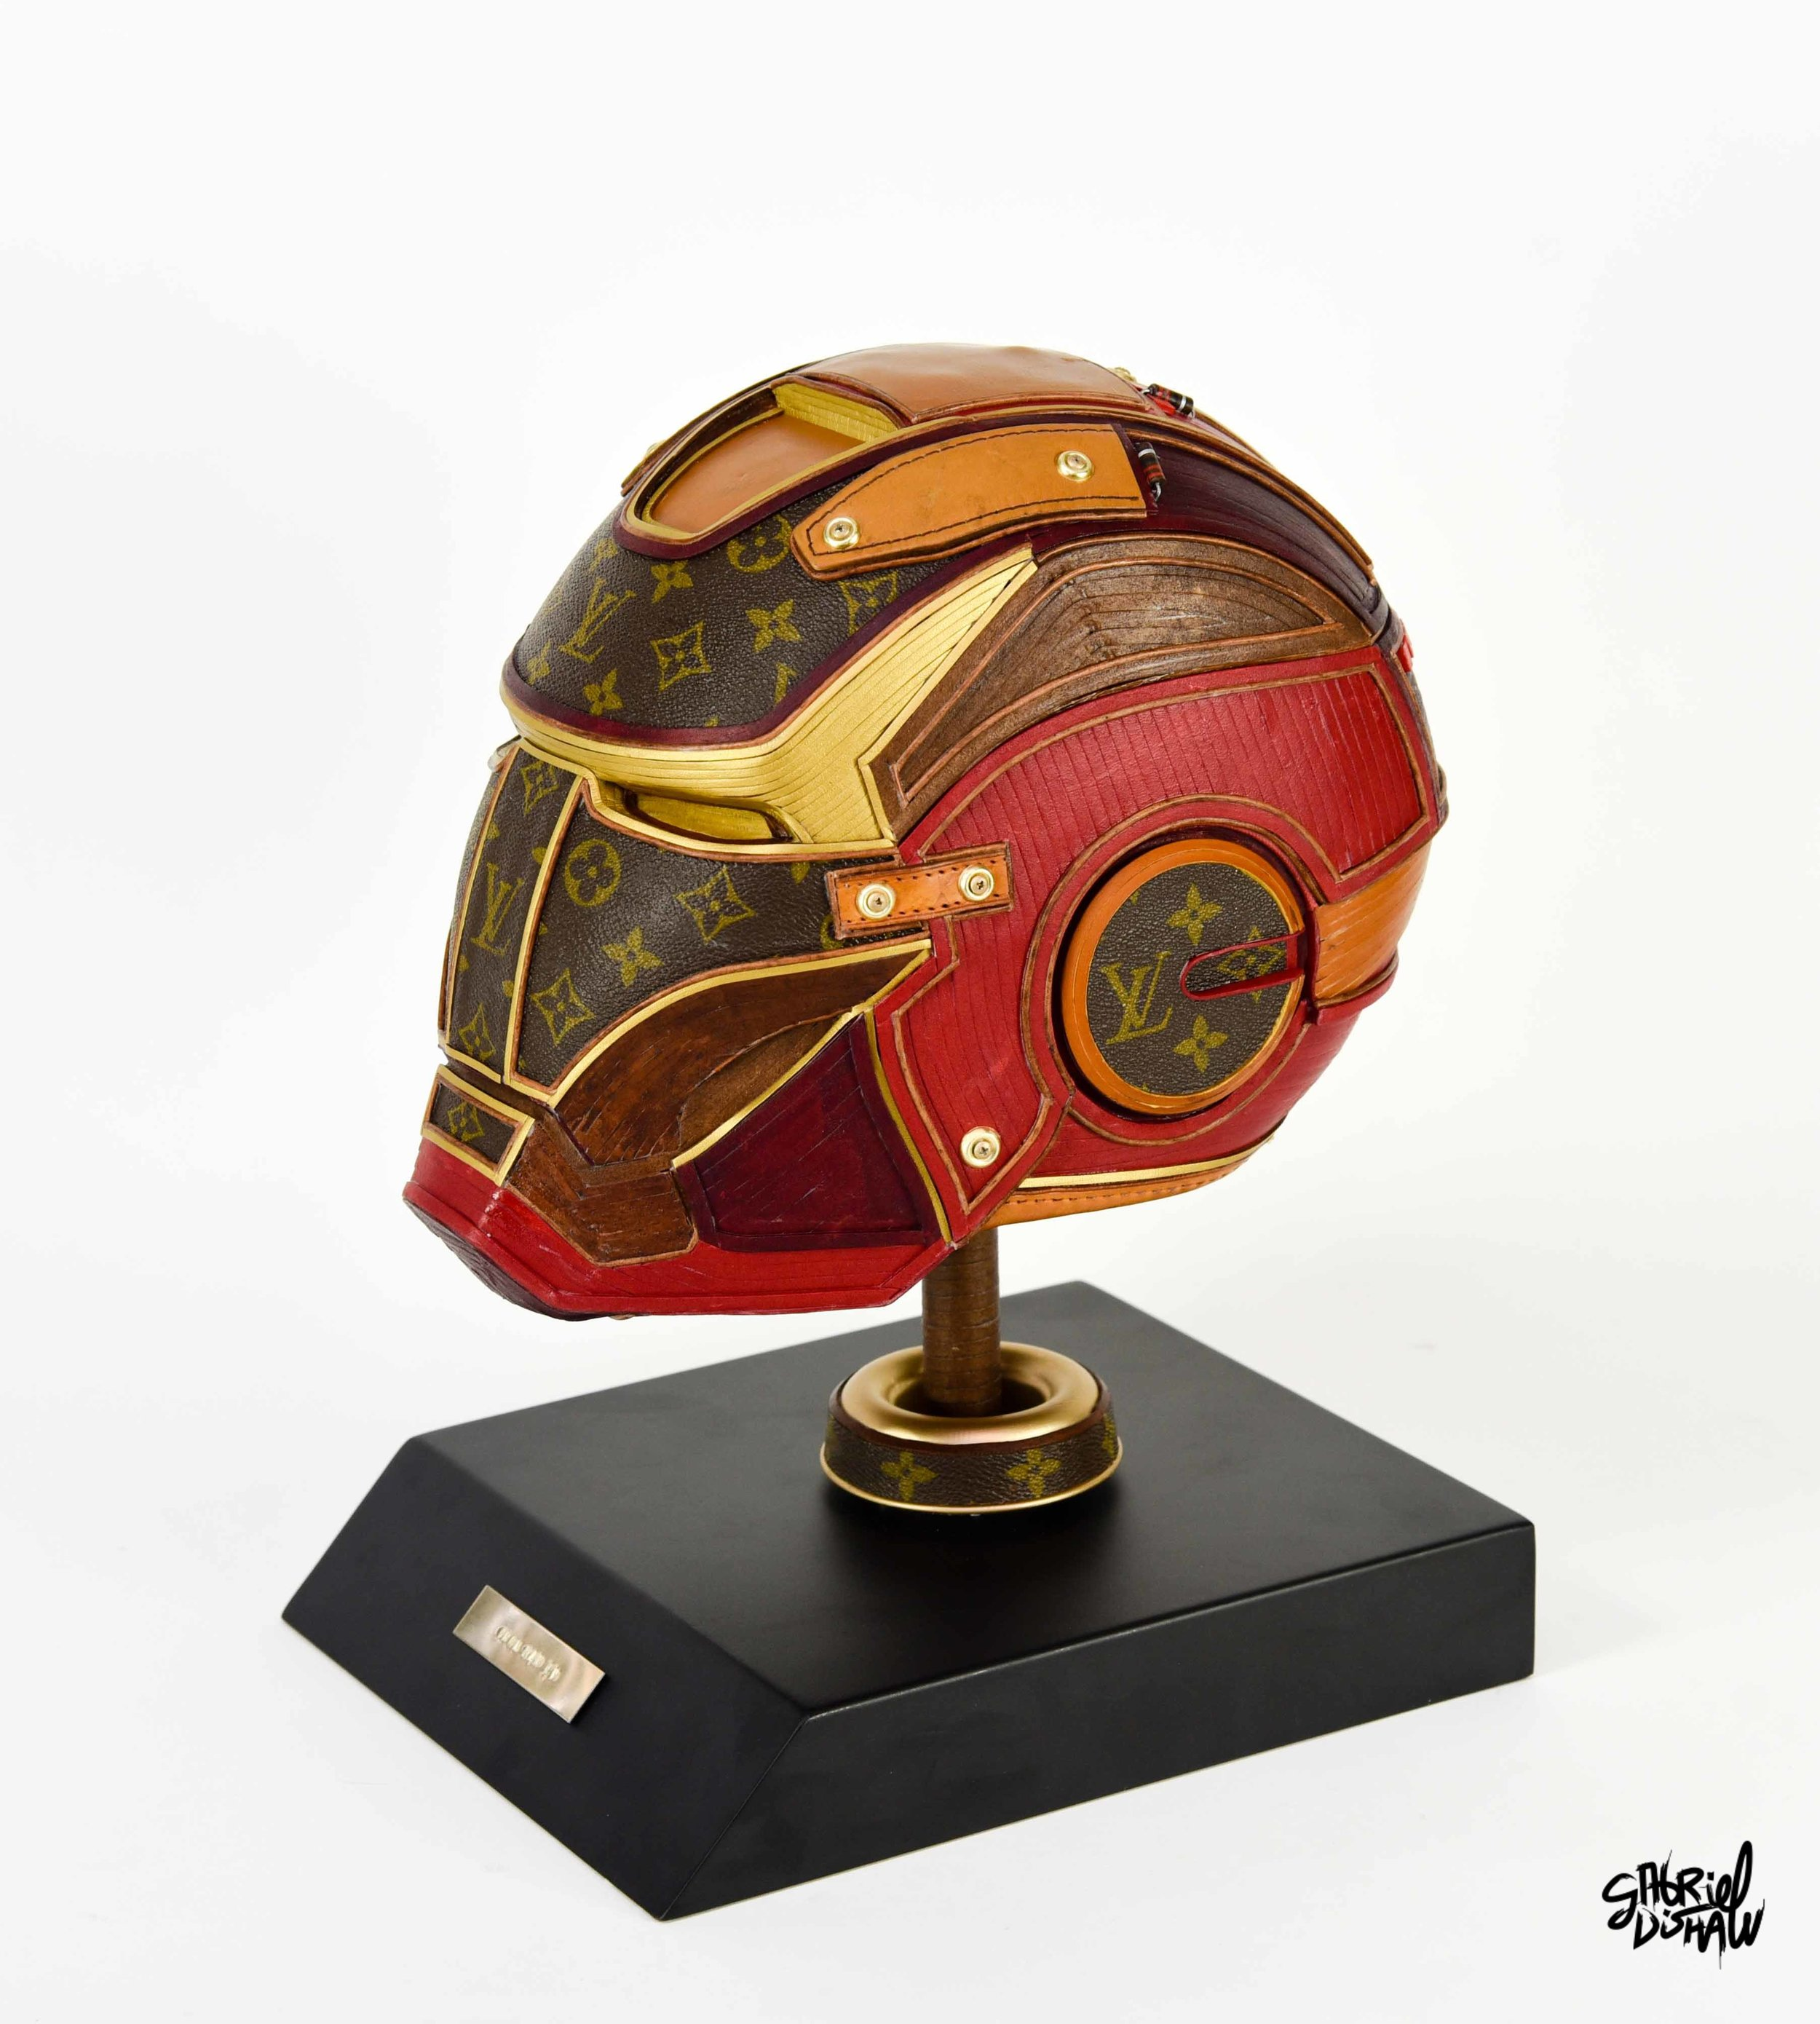 Gabriel Dishaw Iron Man LV-4242.jpg